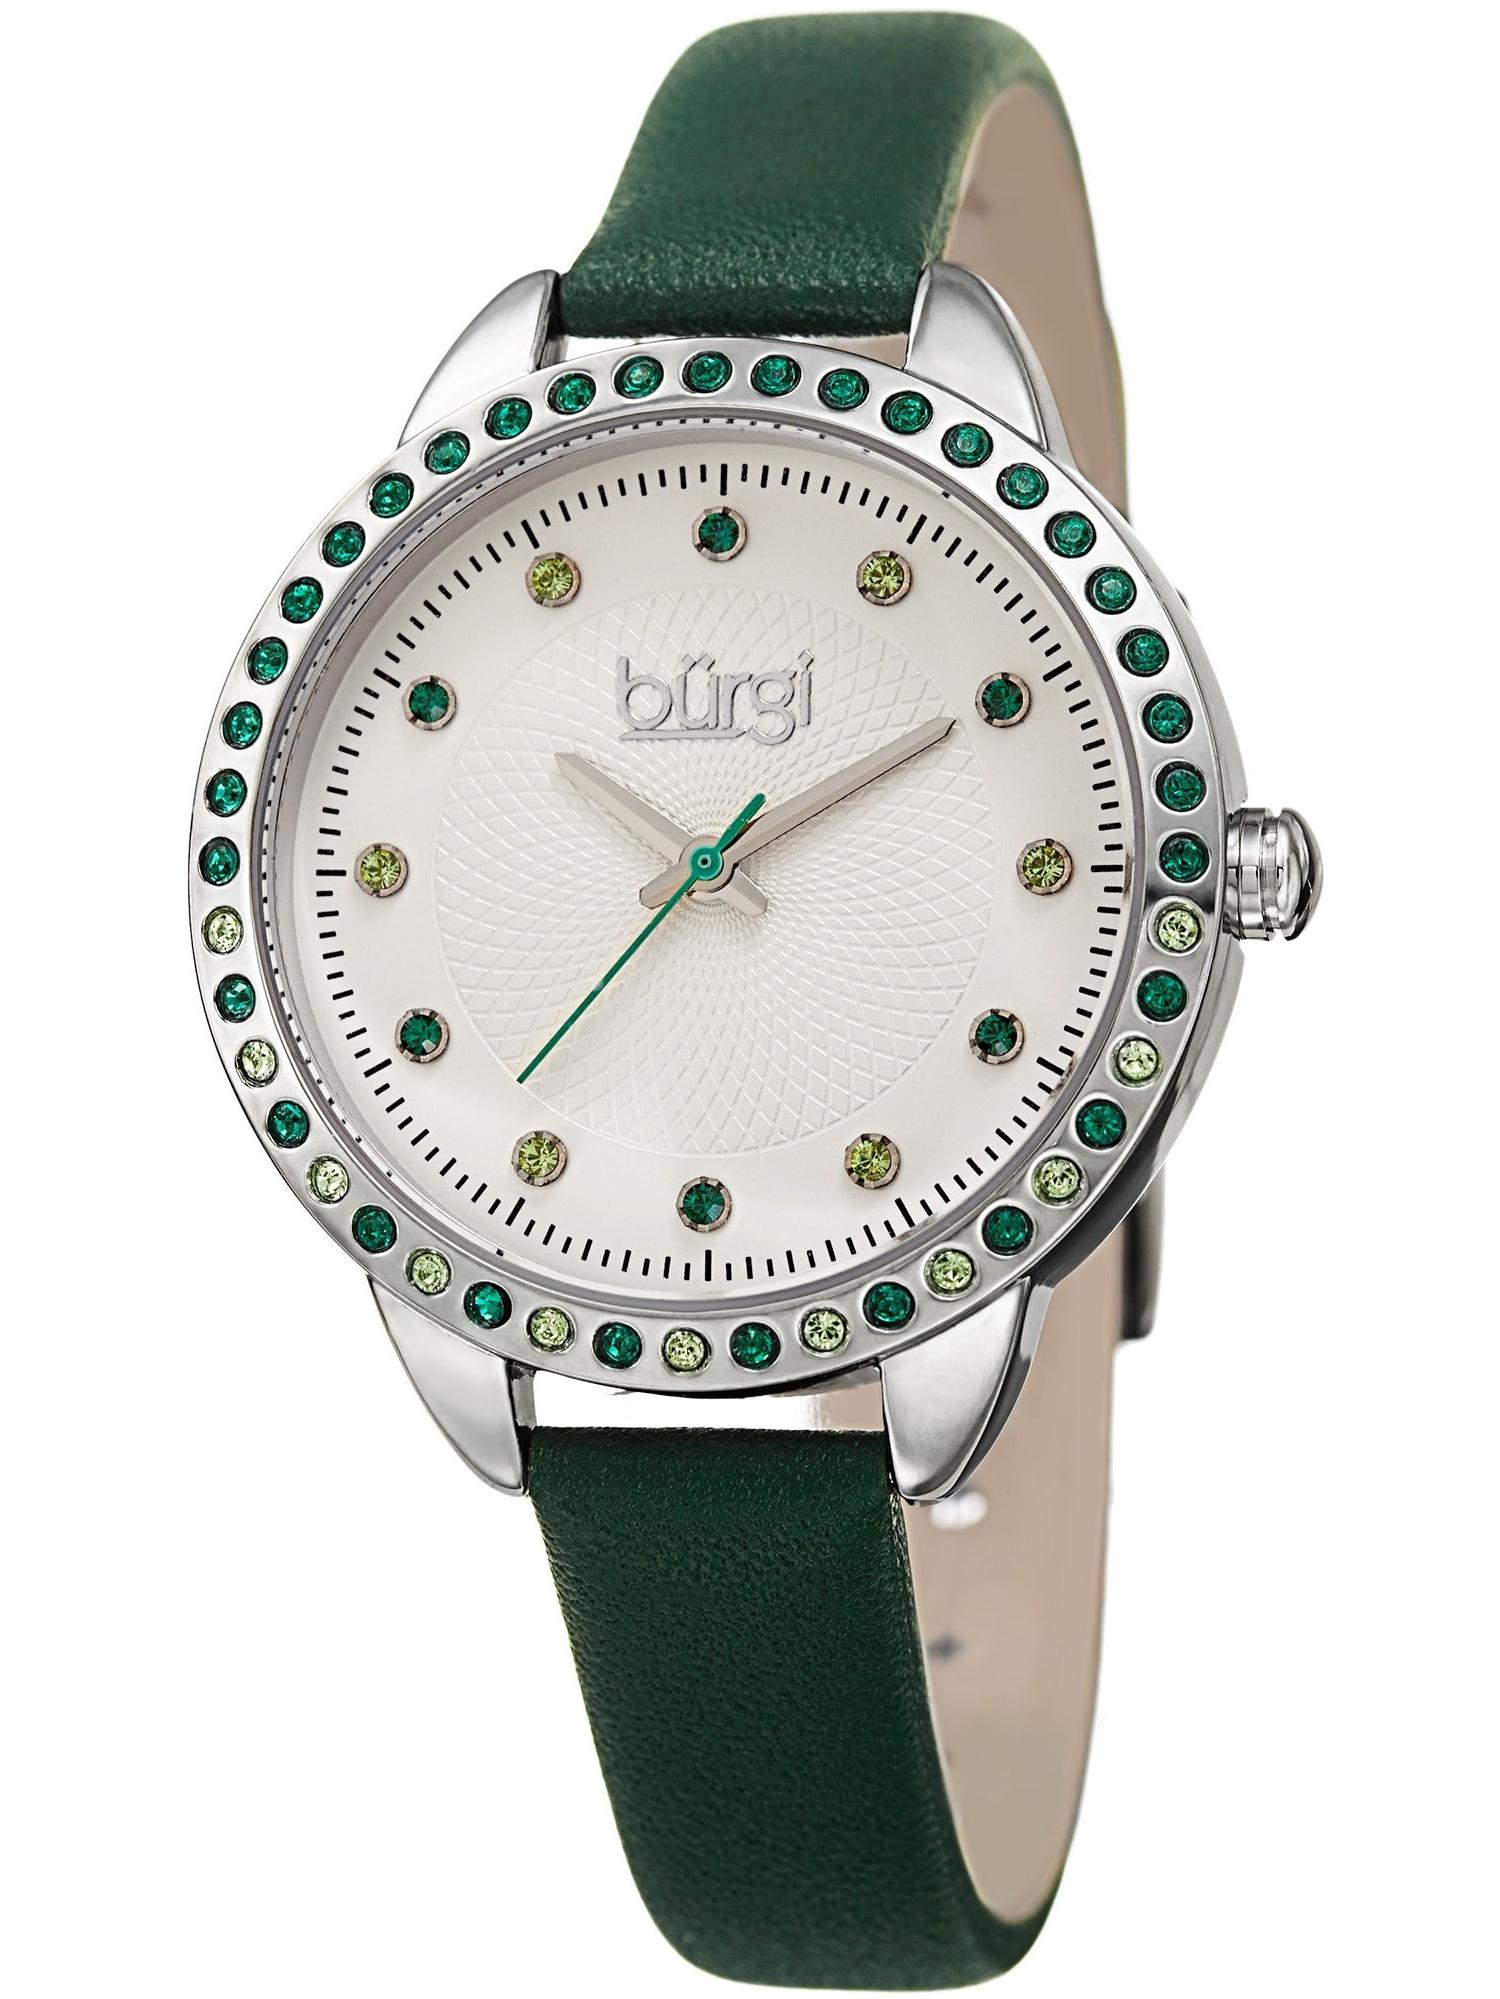 Women's Quartz Swarovski Crystal Green Leather Strap Watch with FREE Bangle